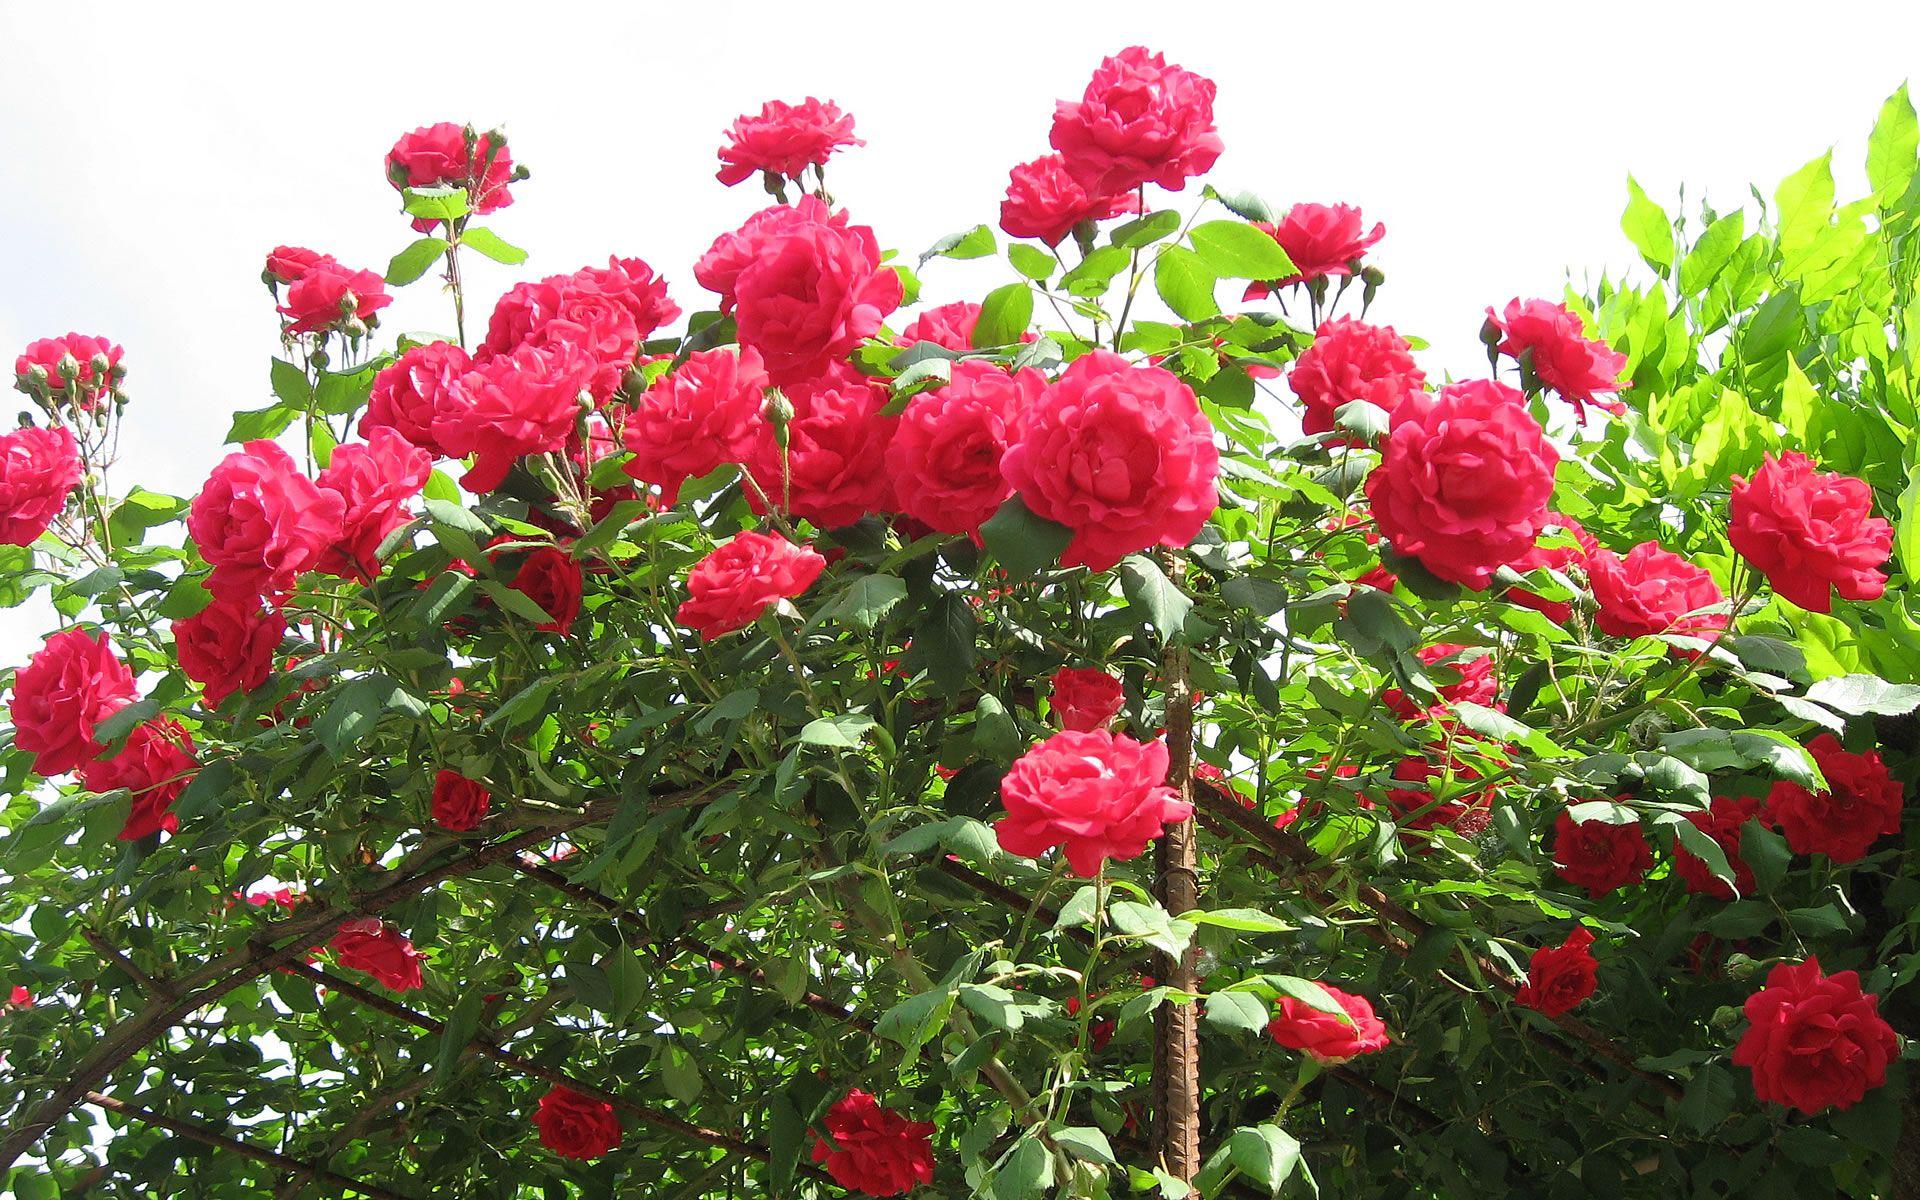 Beautiful Rose Garden Wallpaper flowers wallpapers pink rose flower countless wallpapers | 3d